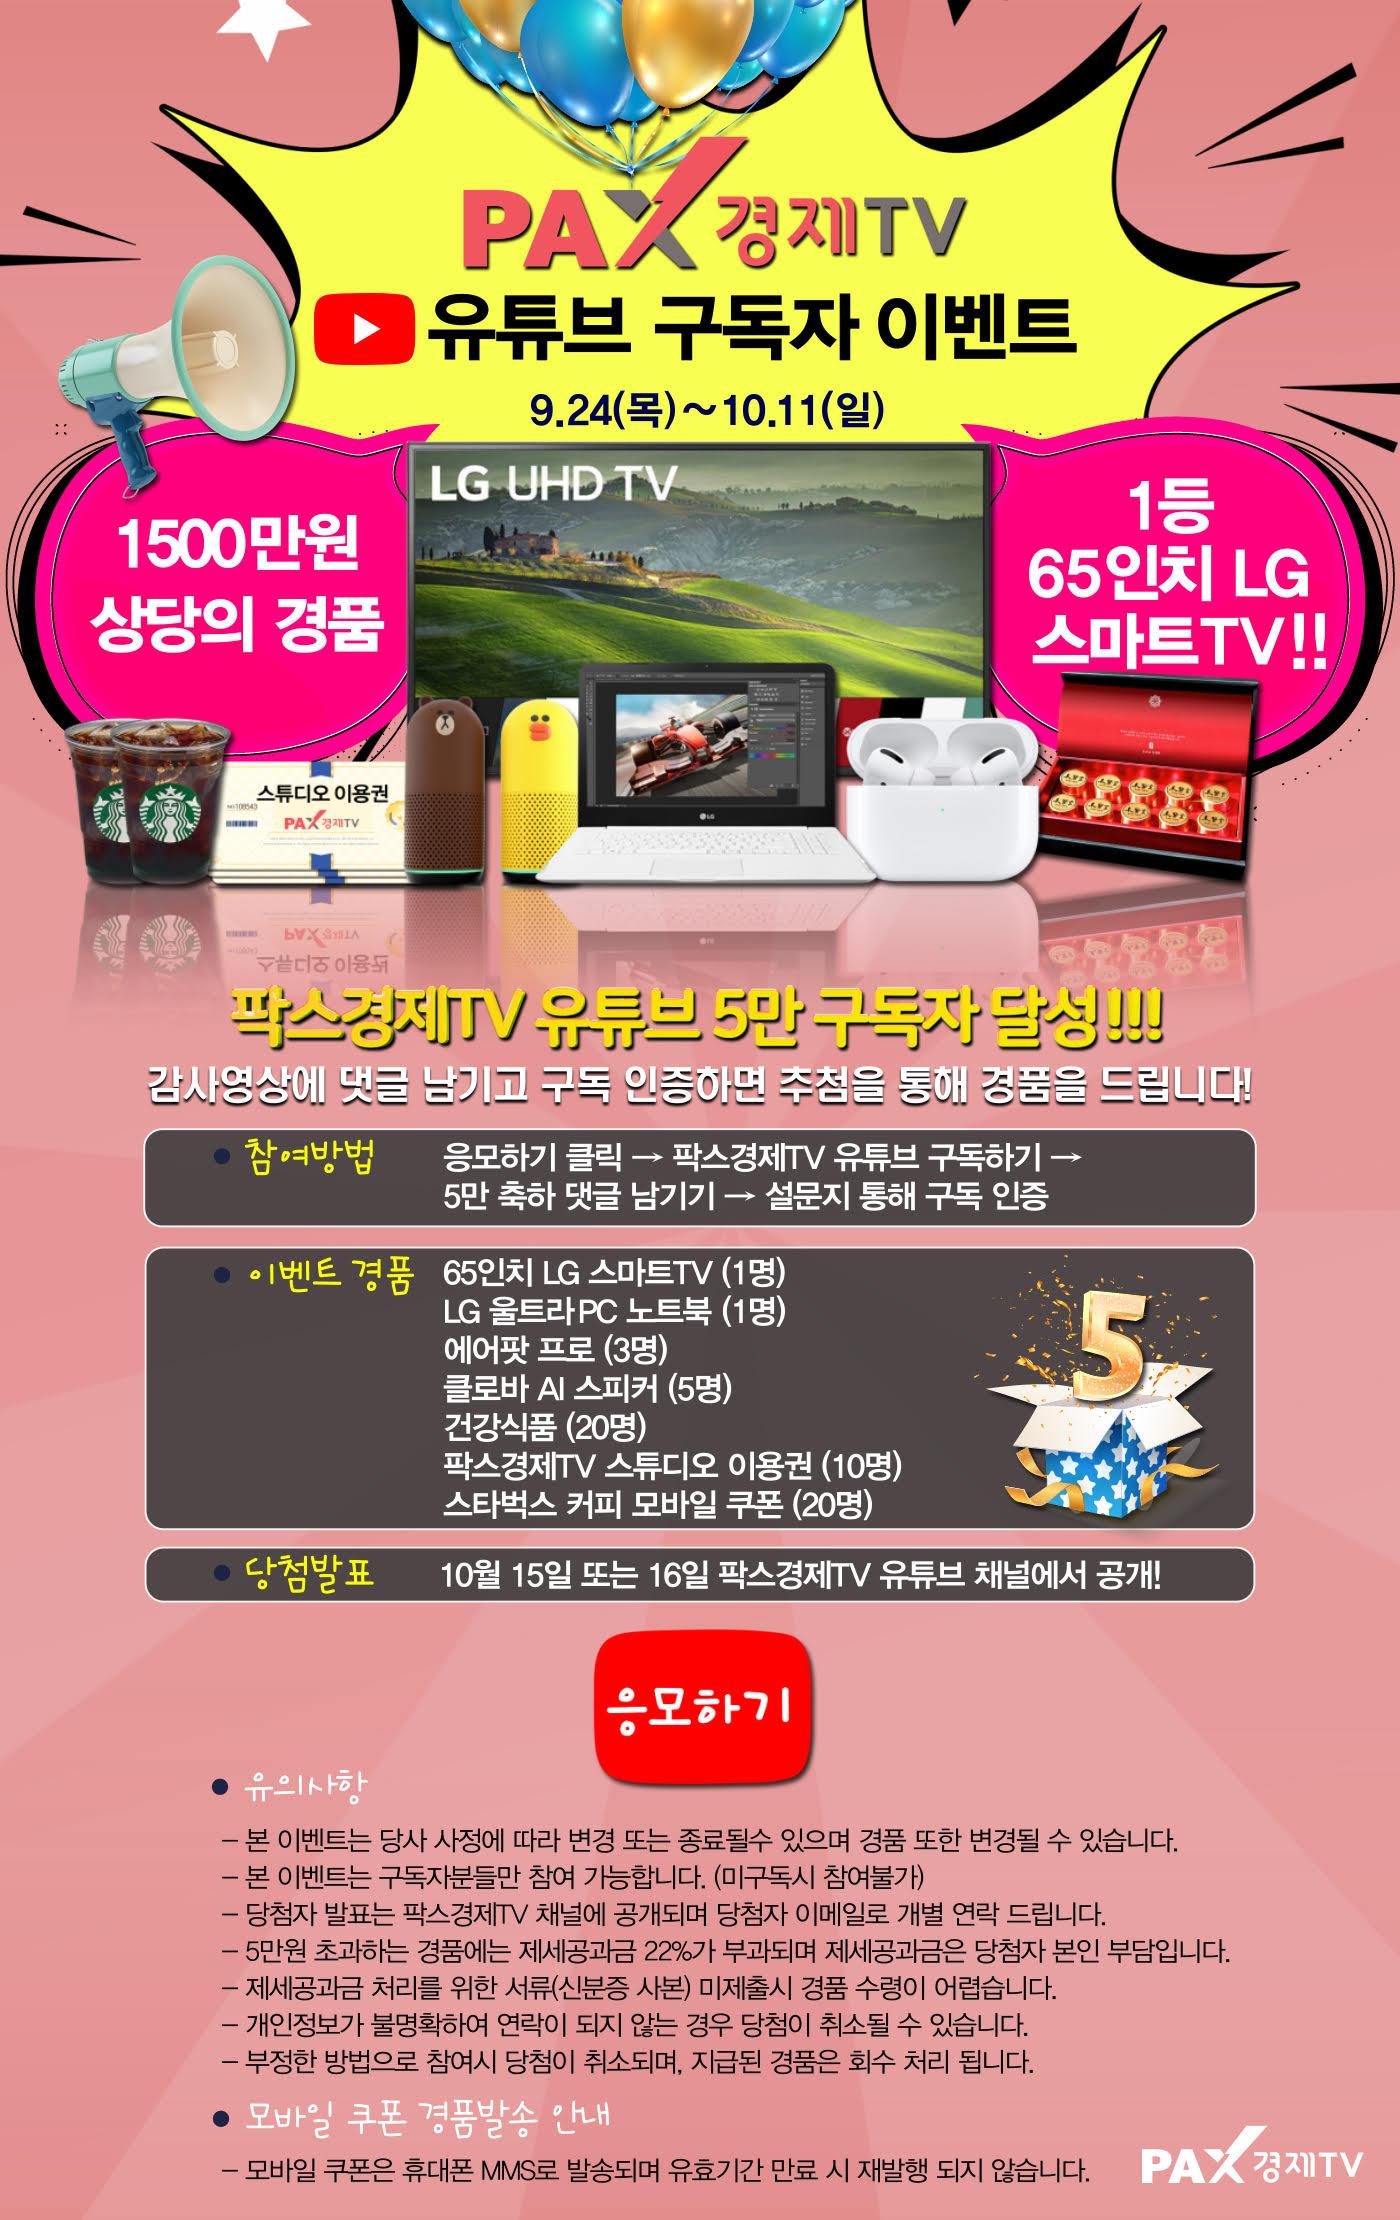 PAX경제TV 유튜브 구독자 이벤트